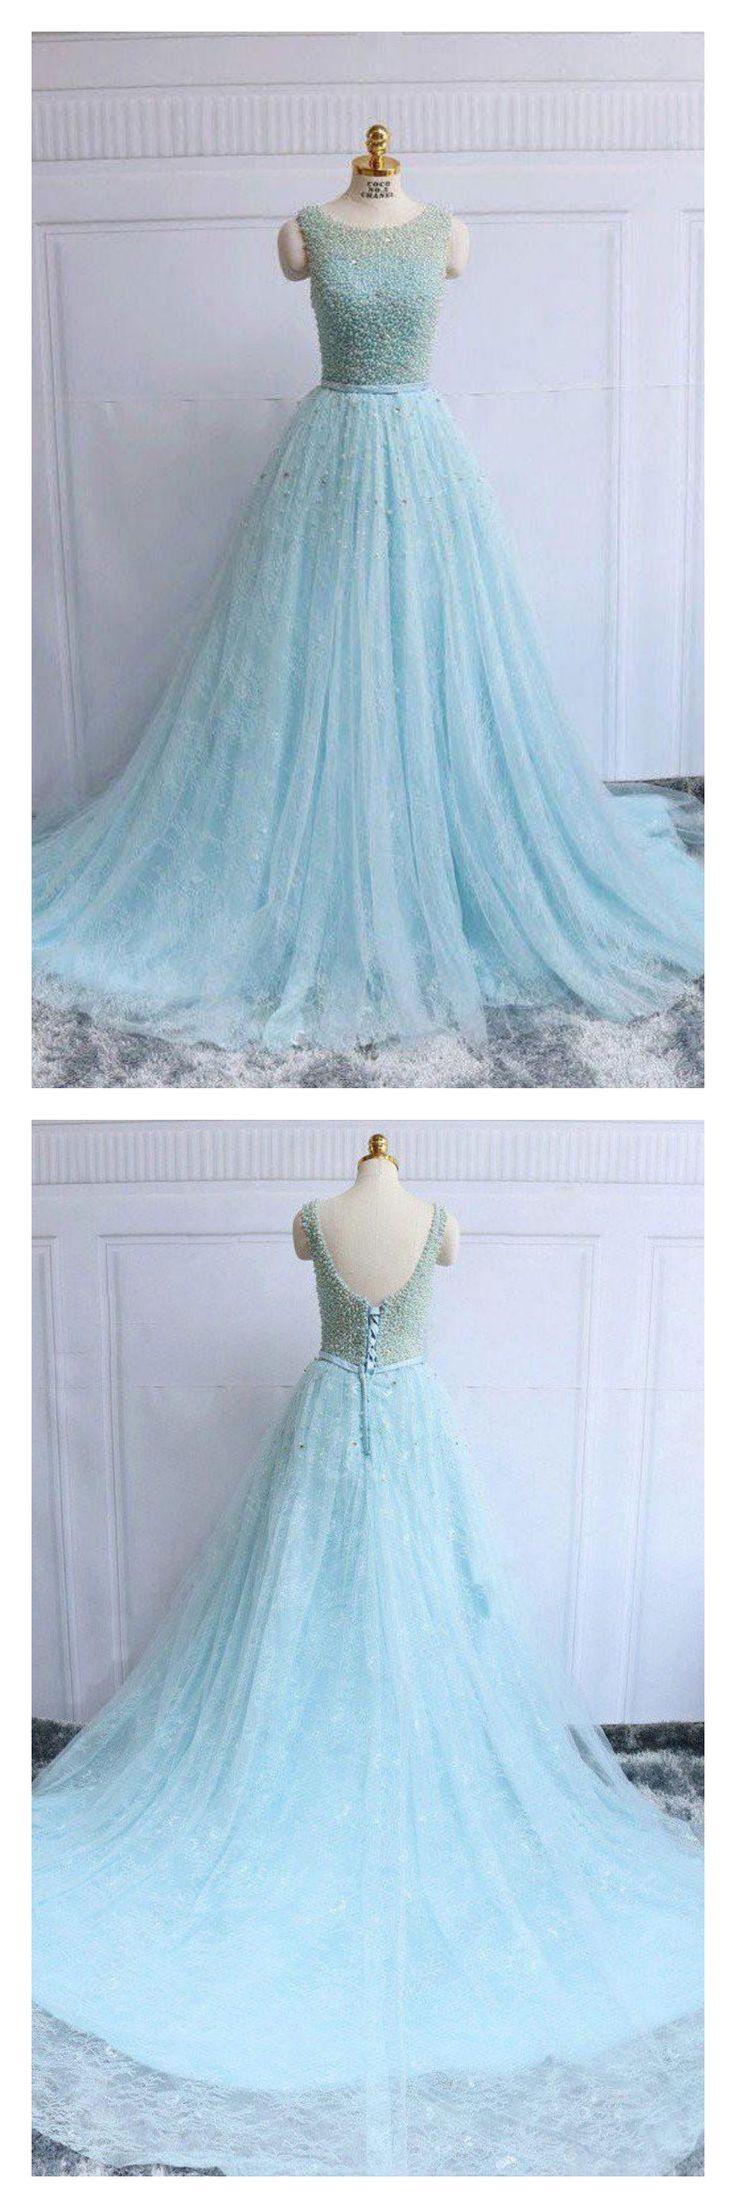 3636 best Beautiful evening dresses images on Pinterest | Cute ...